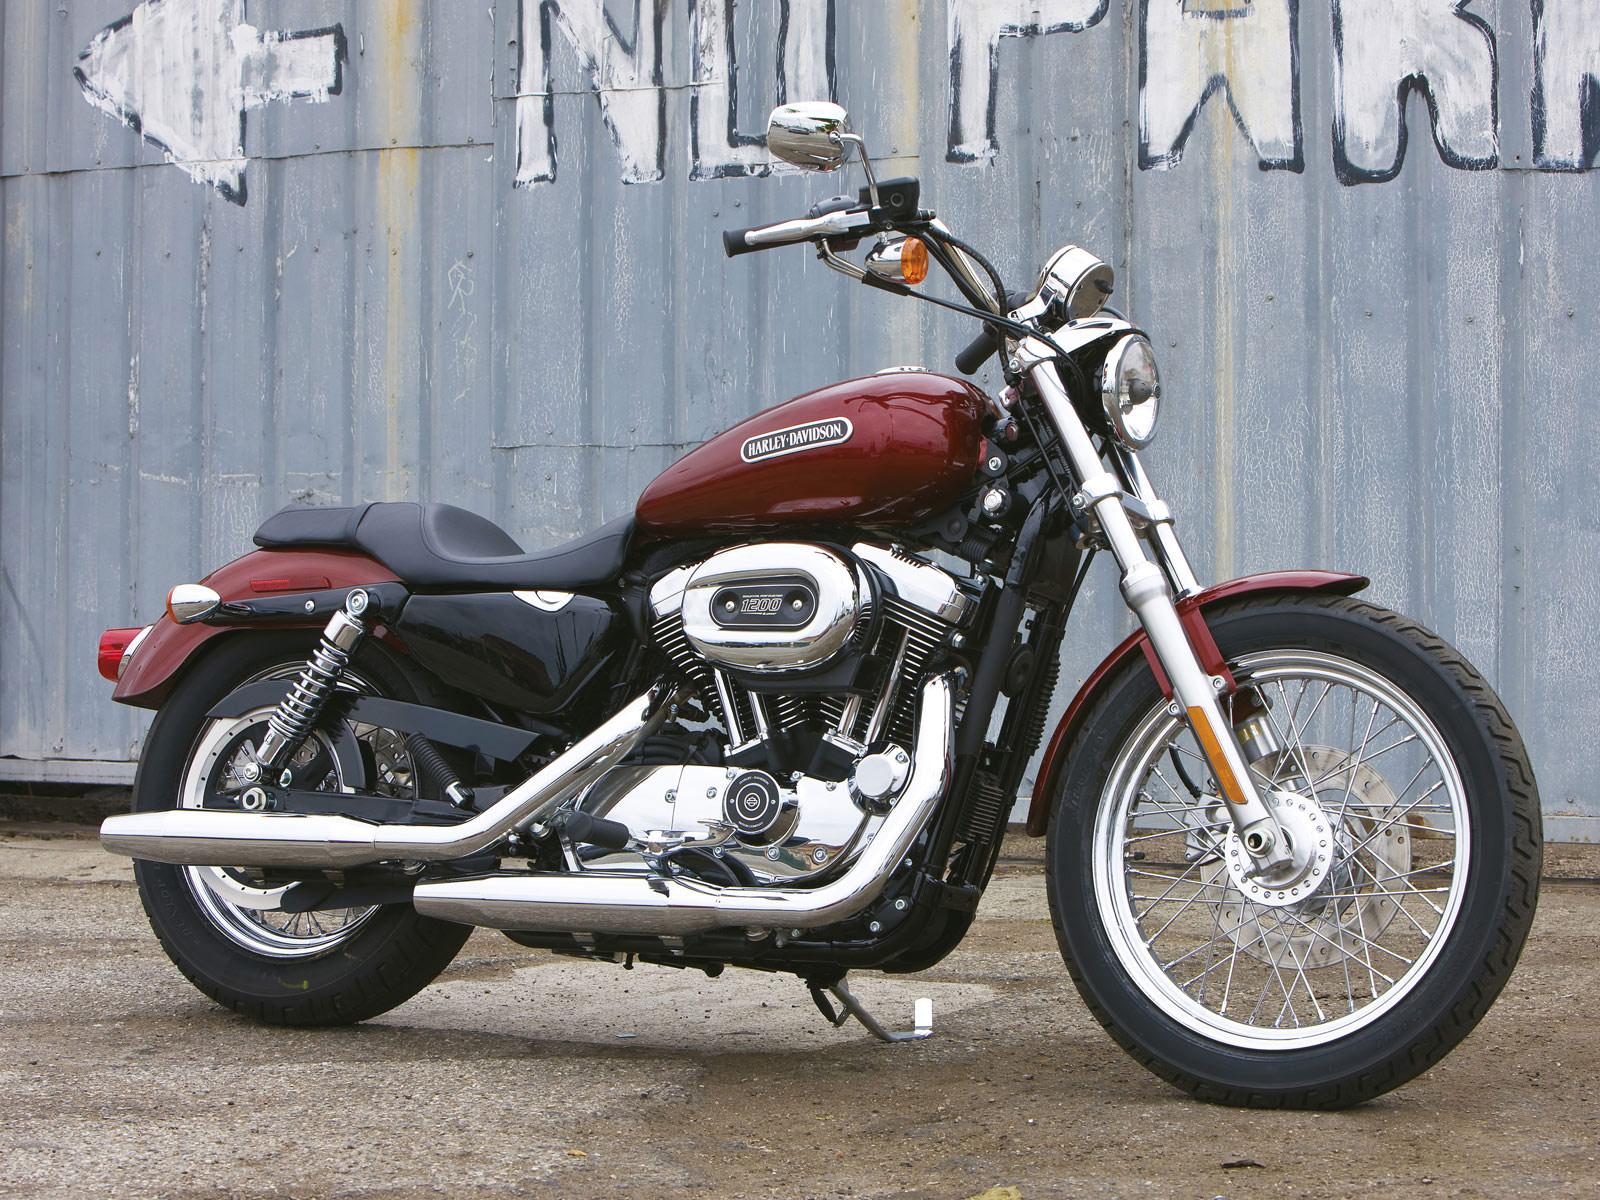 HARLEY DAVIDSON XL 1200 L Sportster 1200 Low